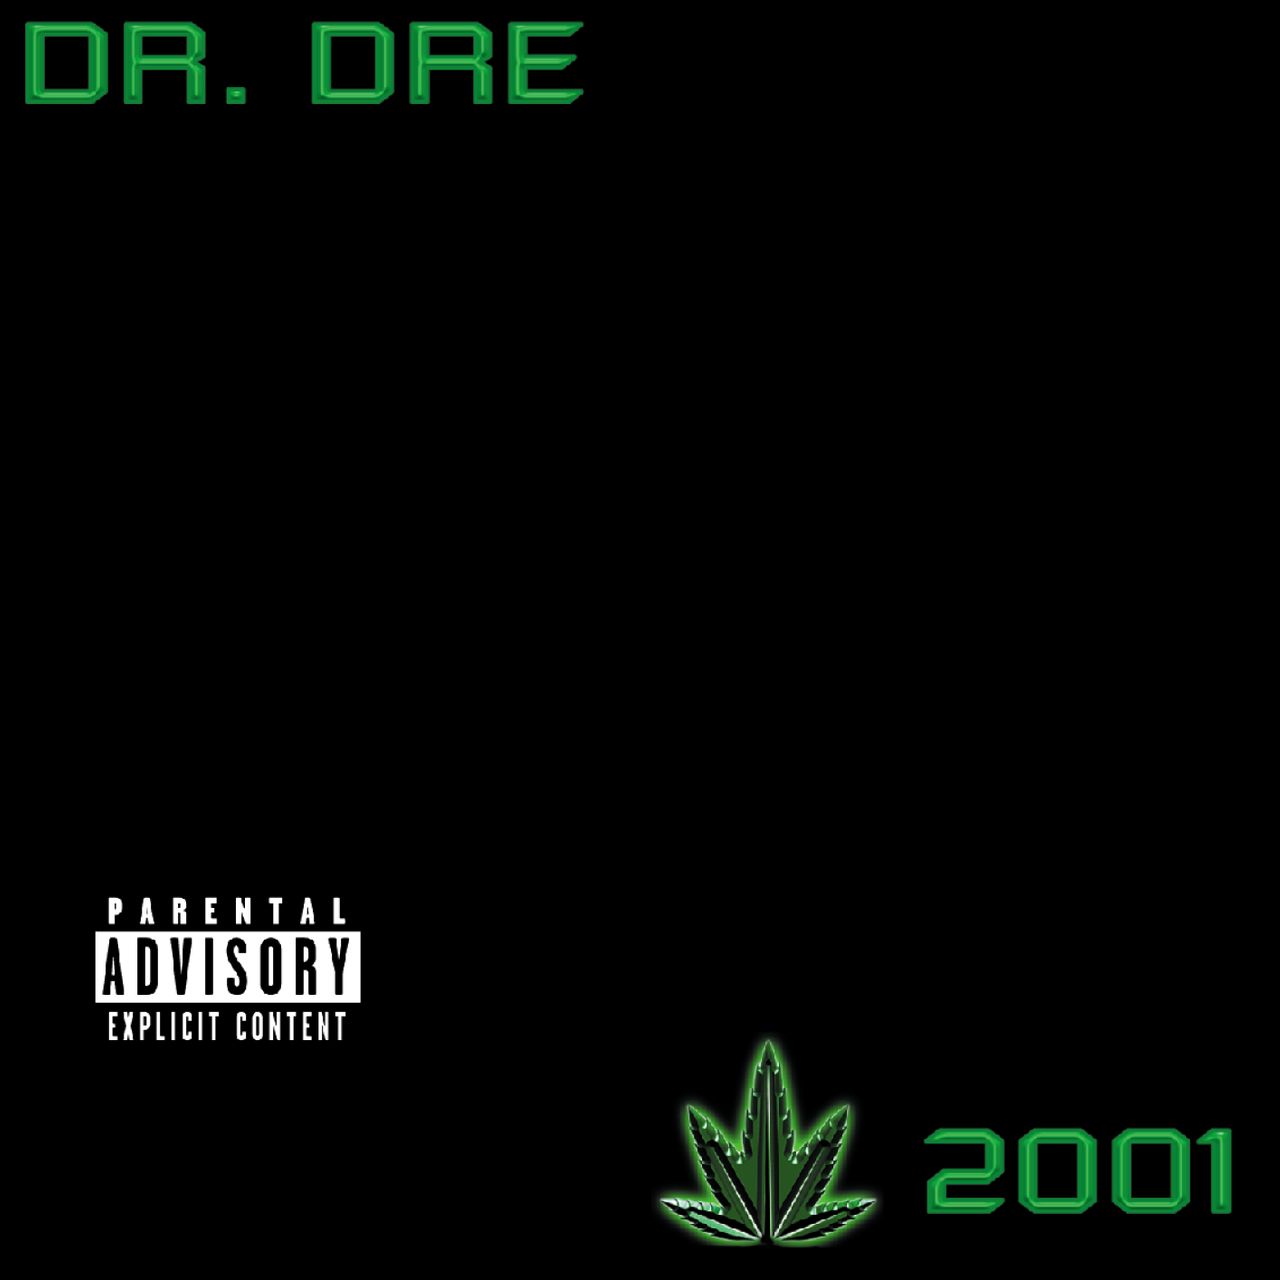 2001-album-review